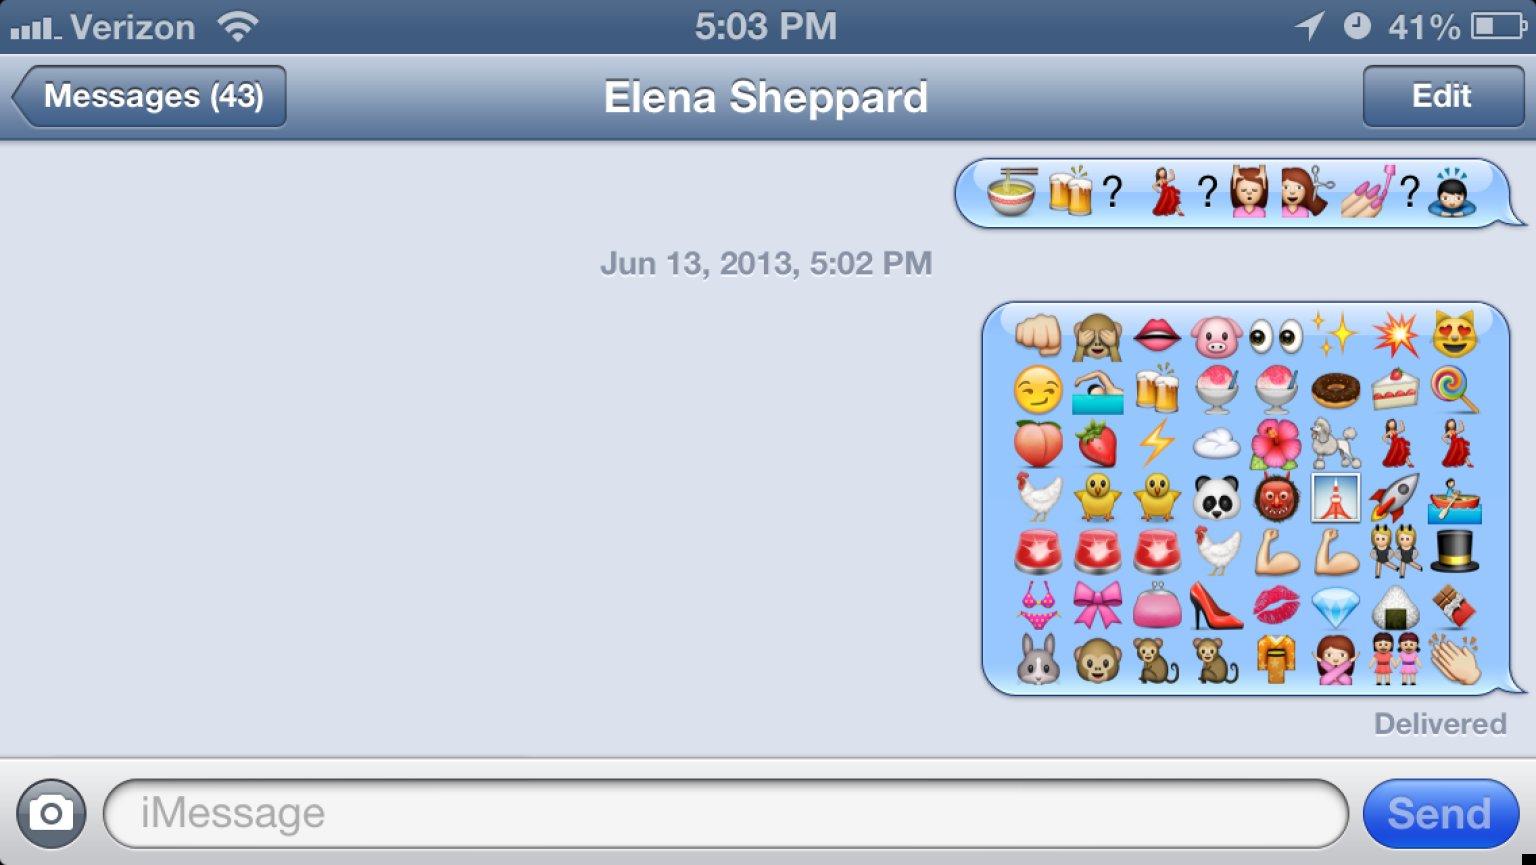 emoji pictures emoji images emoji wallpapers hd emoji photos emoji 1536x865